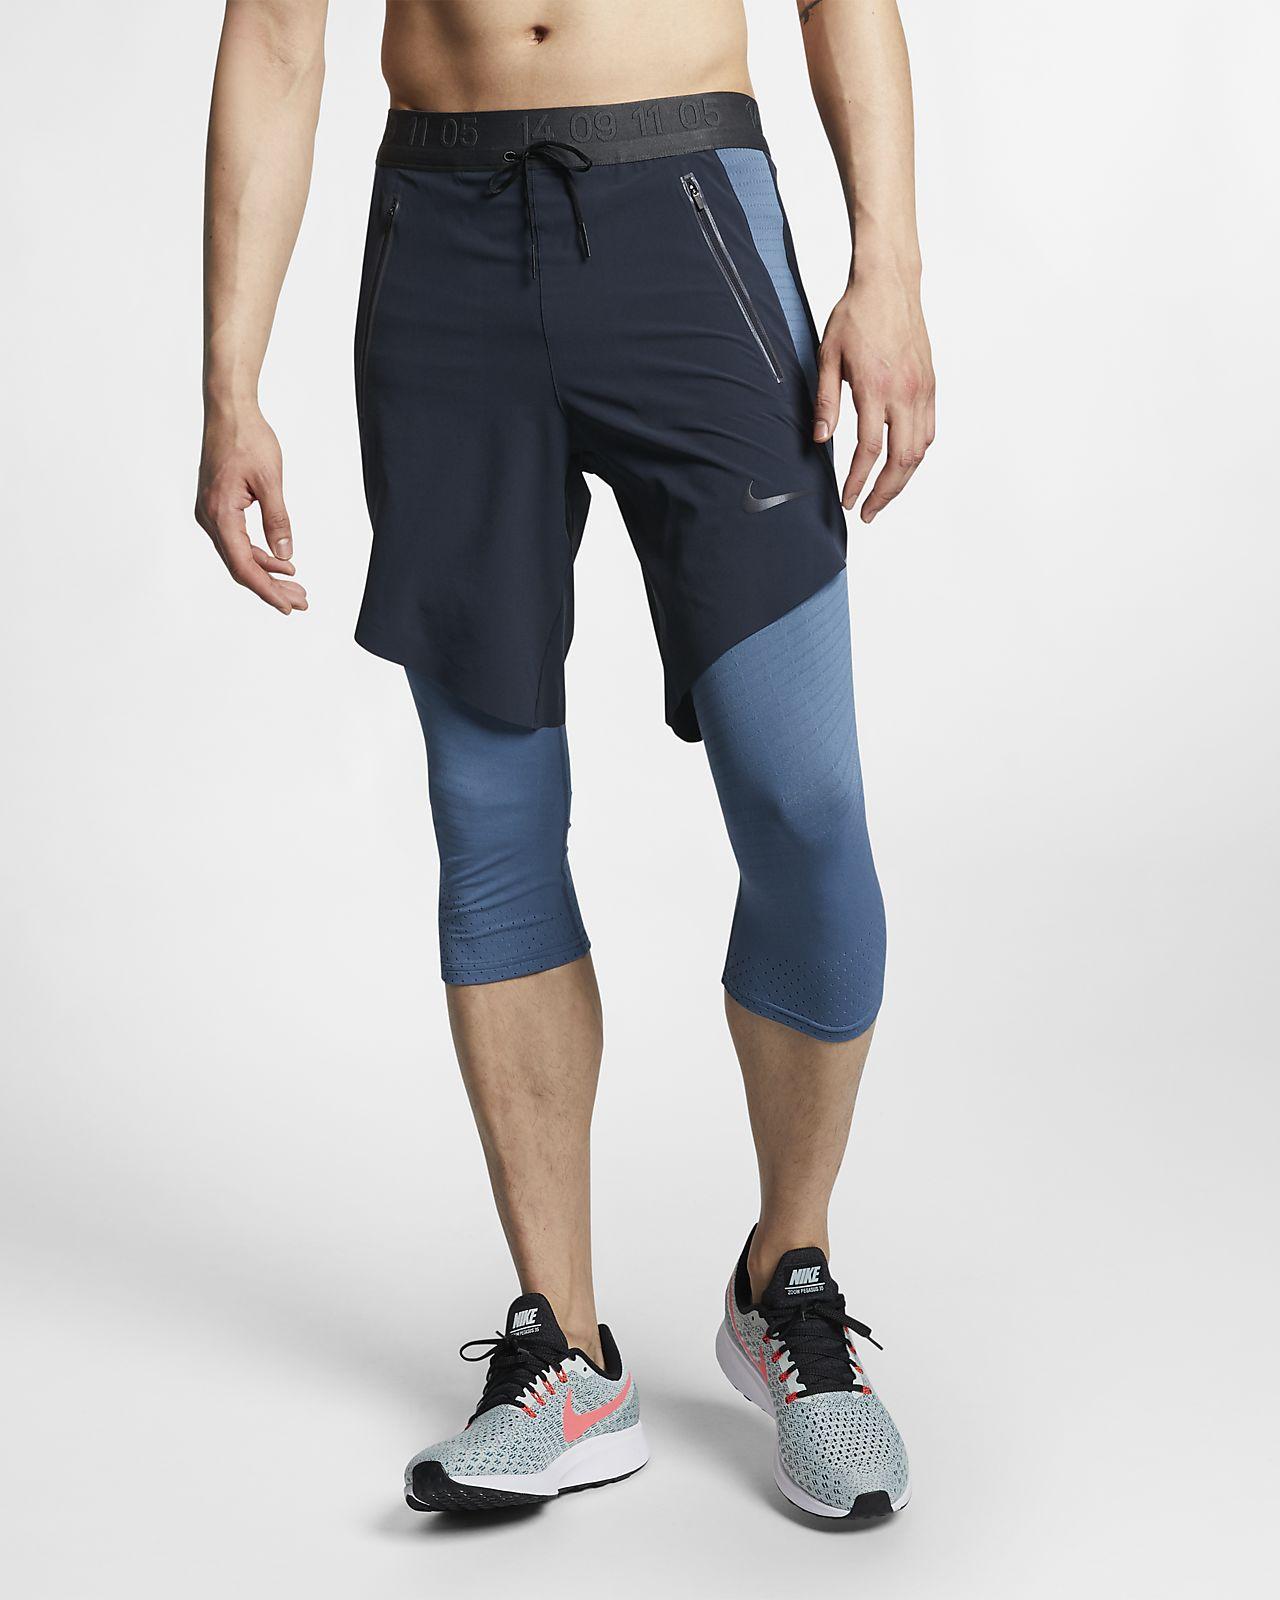 Pantalones de running 3/4 para hombre Nike Tech Pack